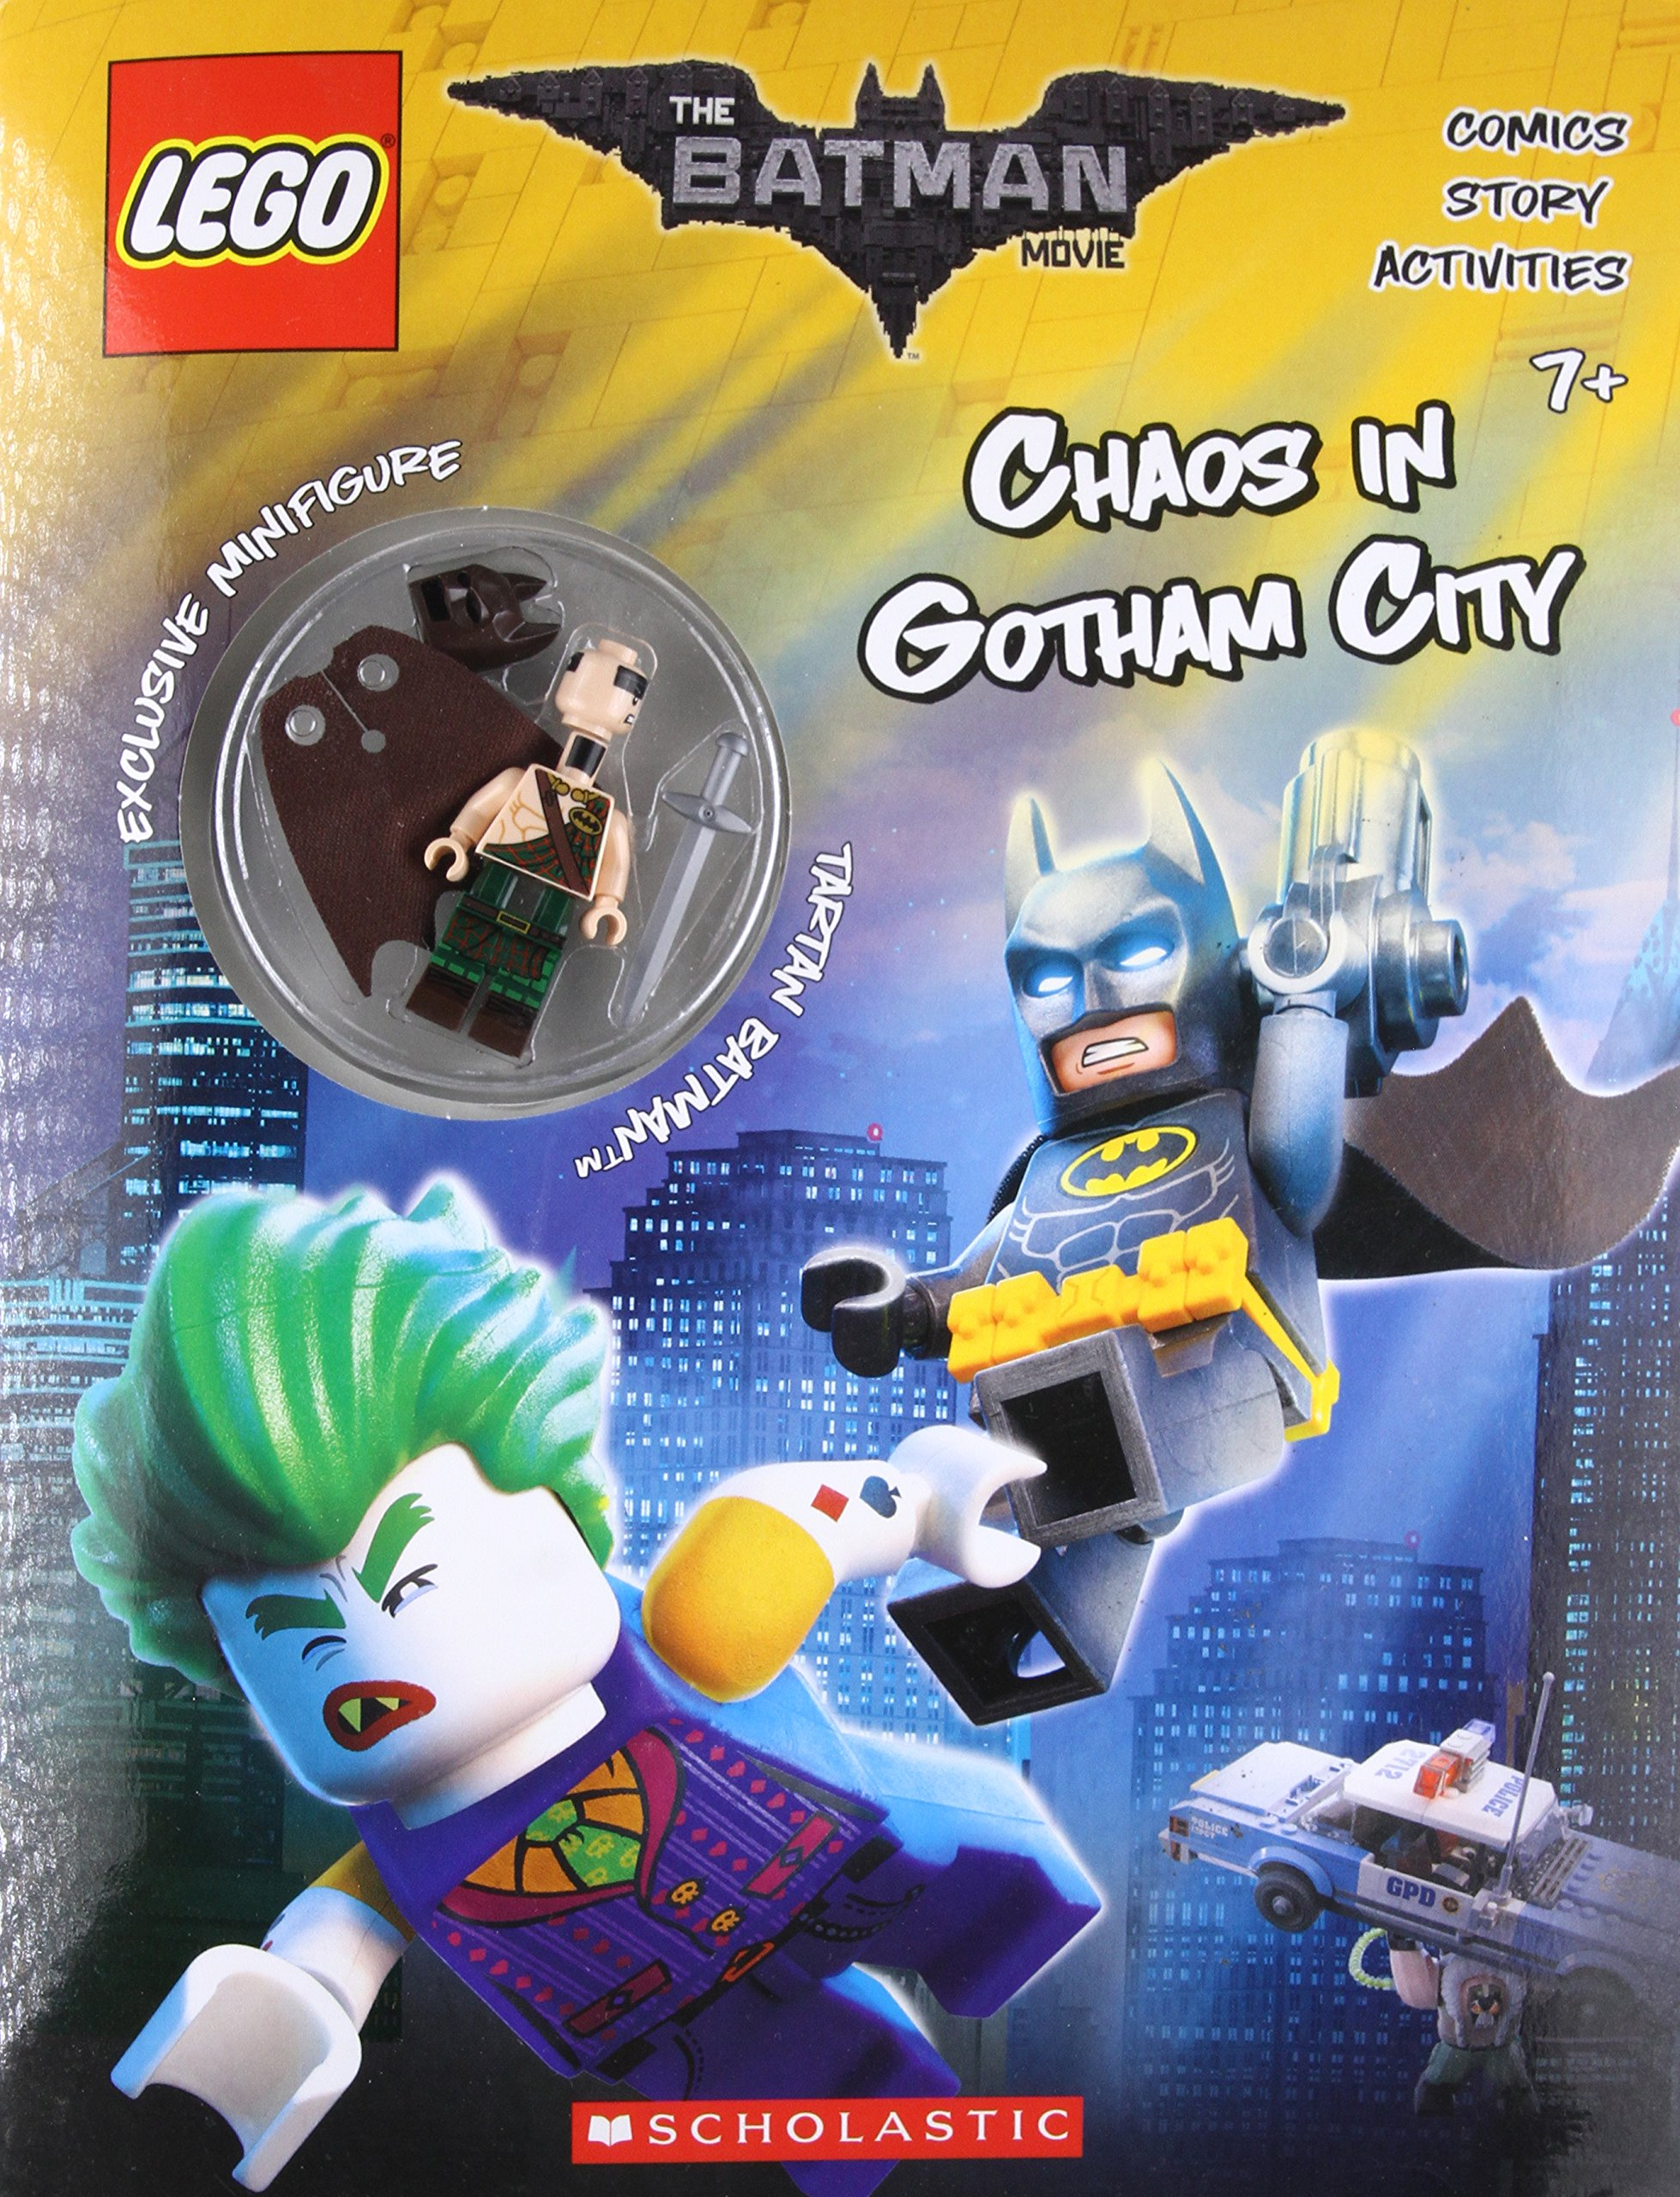 Amazon Com Chaos In Gotham City The Lego Batman Movie Activity Book With Minfigure 9781338112122 Ameet Studio Books